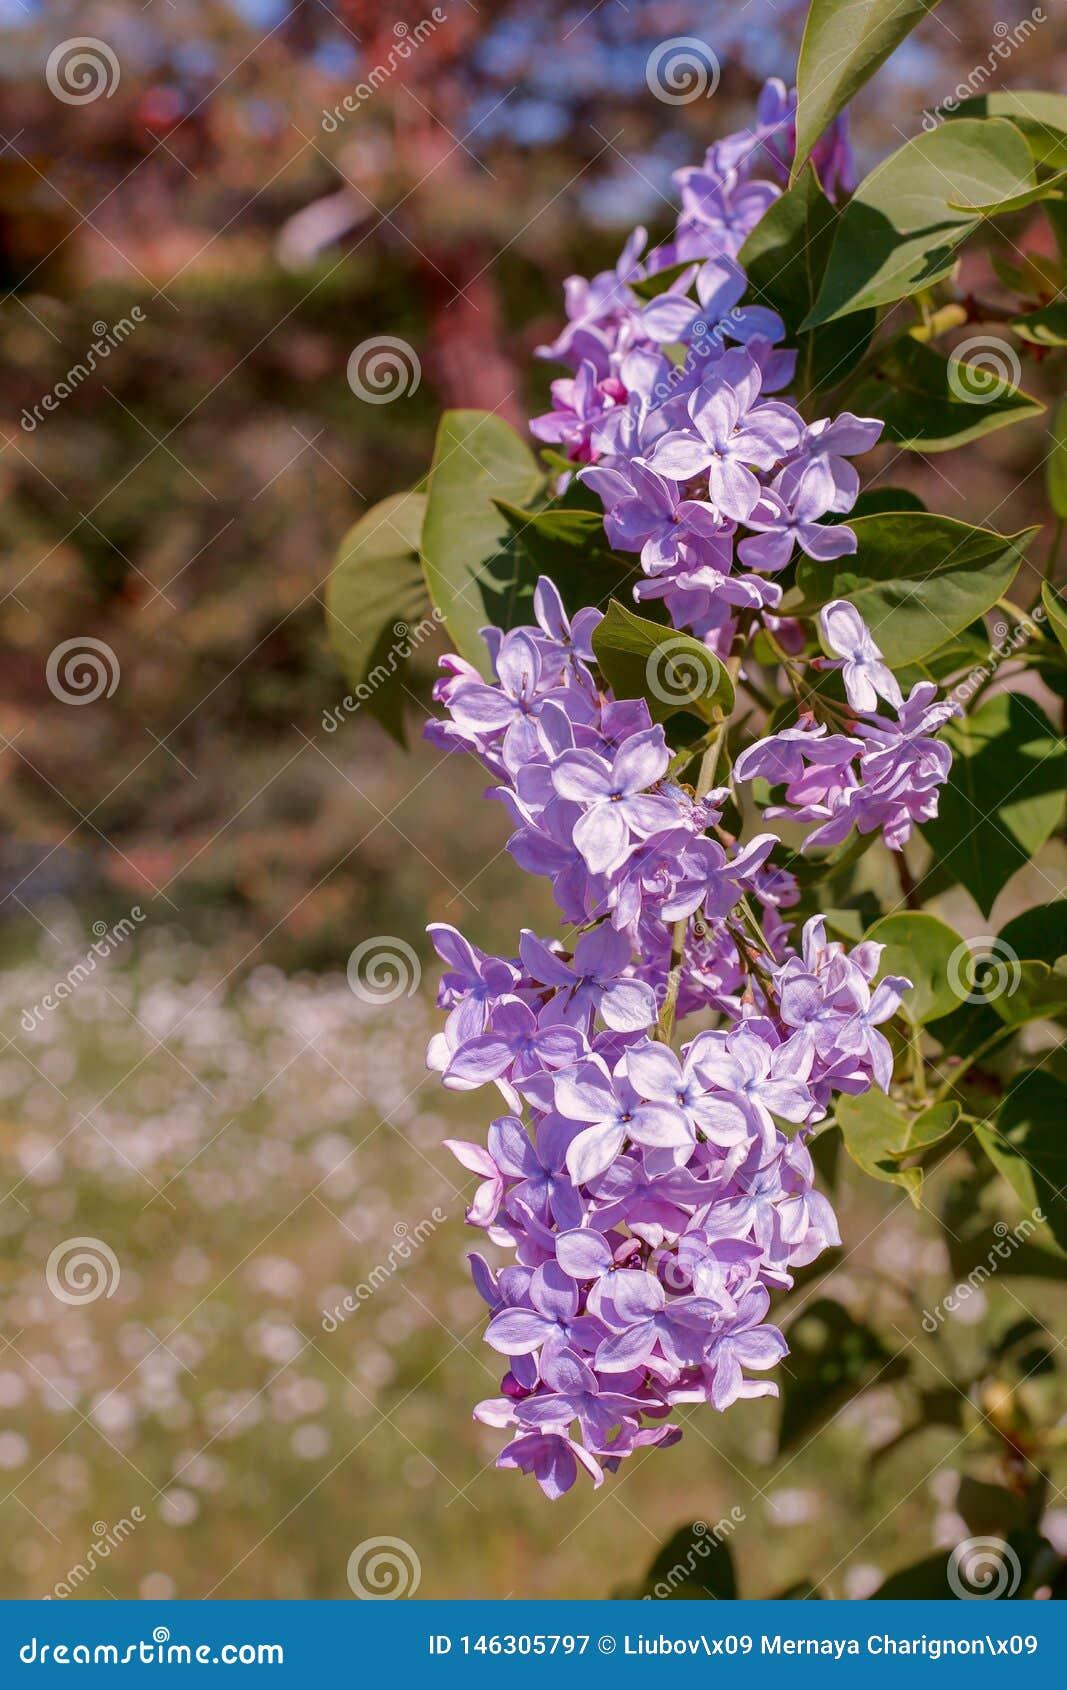 Fundo borrado abstrato com bokeh e ramo de florescência do lilás ou do syringa na primavera Papel de parede da natureza da mola